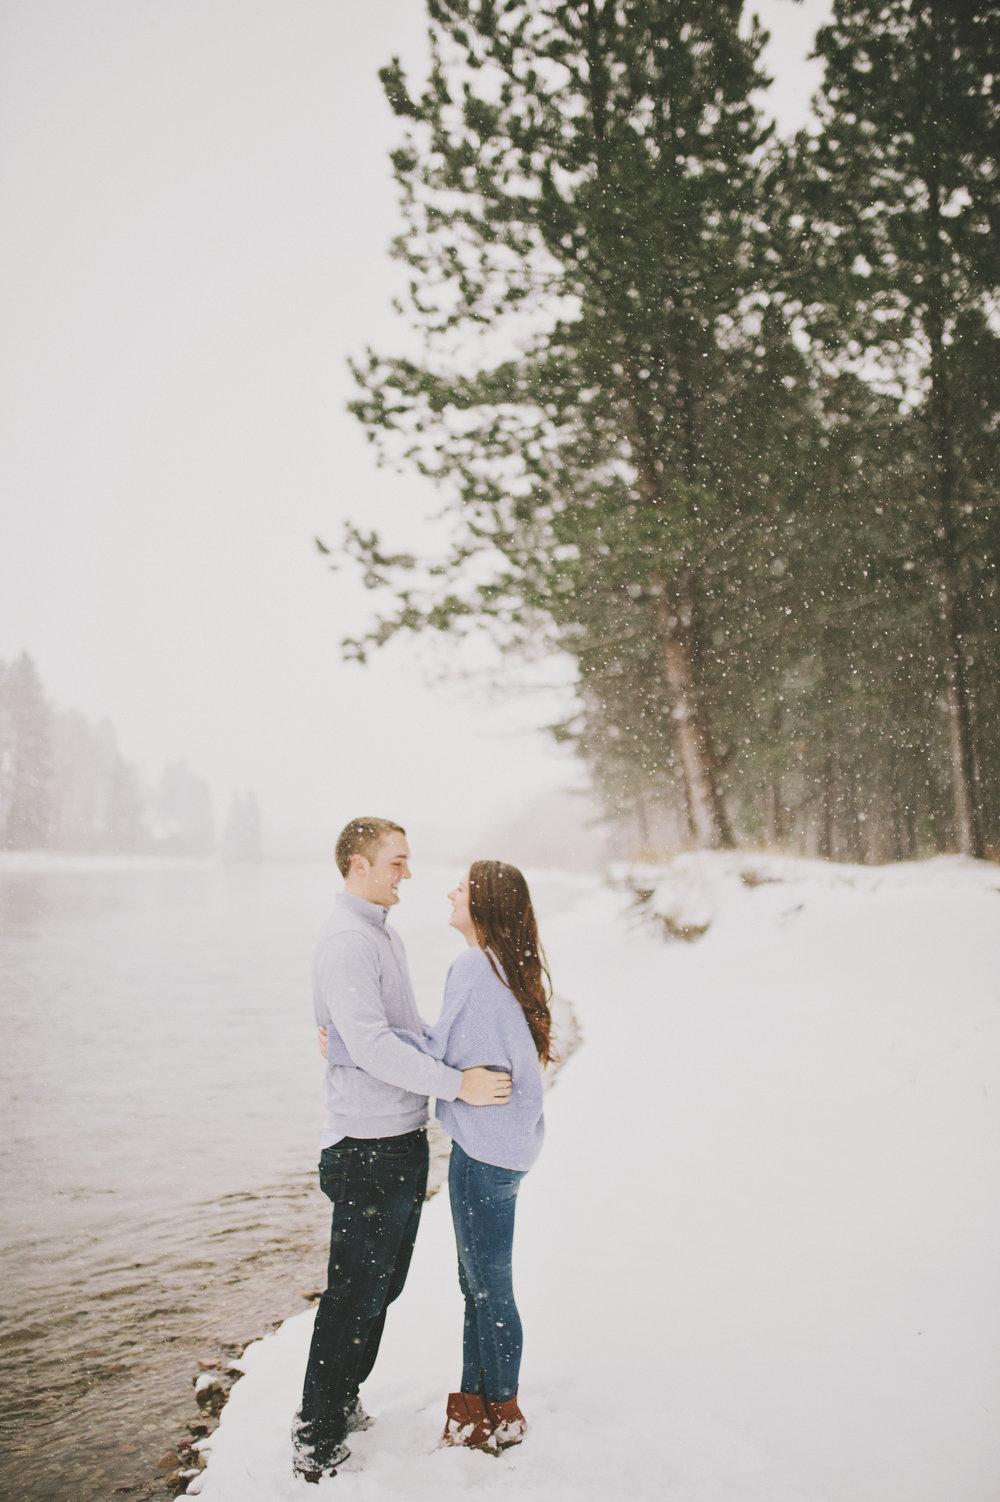 011 Winter Engagement Session_Missoula Engagement Session_Fun Engagement_Blue and Grey Engagement_Kelsey Lane Photography_Tifani + Ryan-2505 copy.jpg